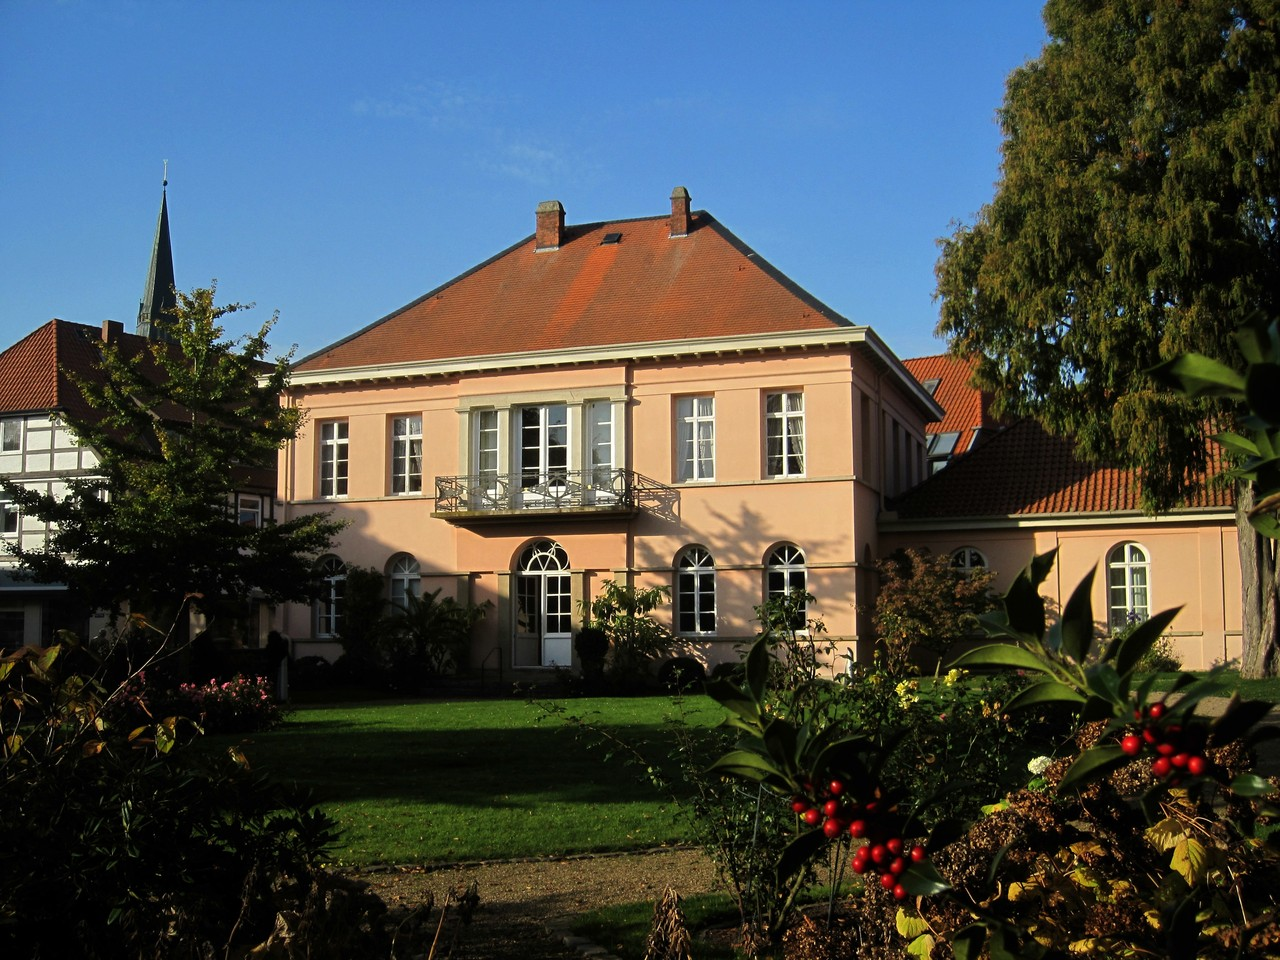 Quaet-Faslem-Haus im klassizistischen Stil